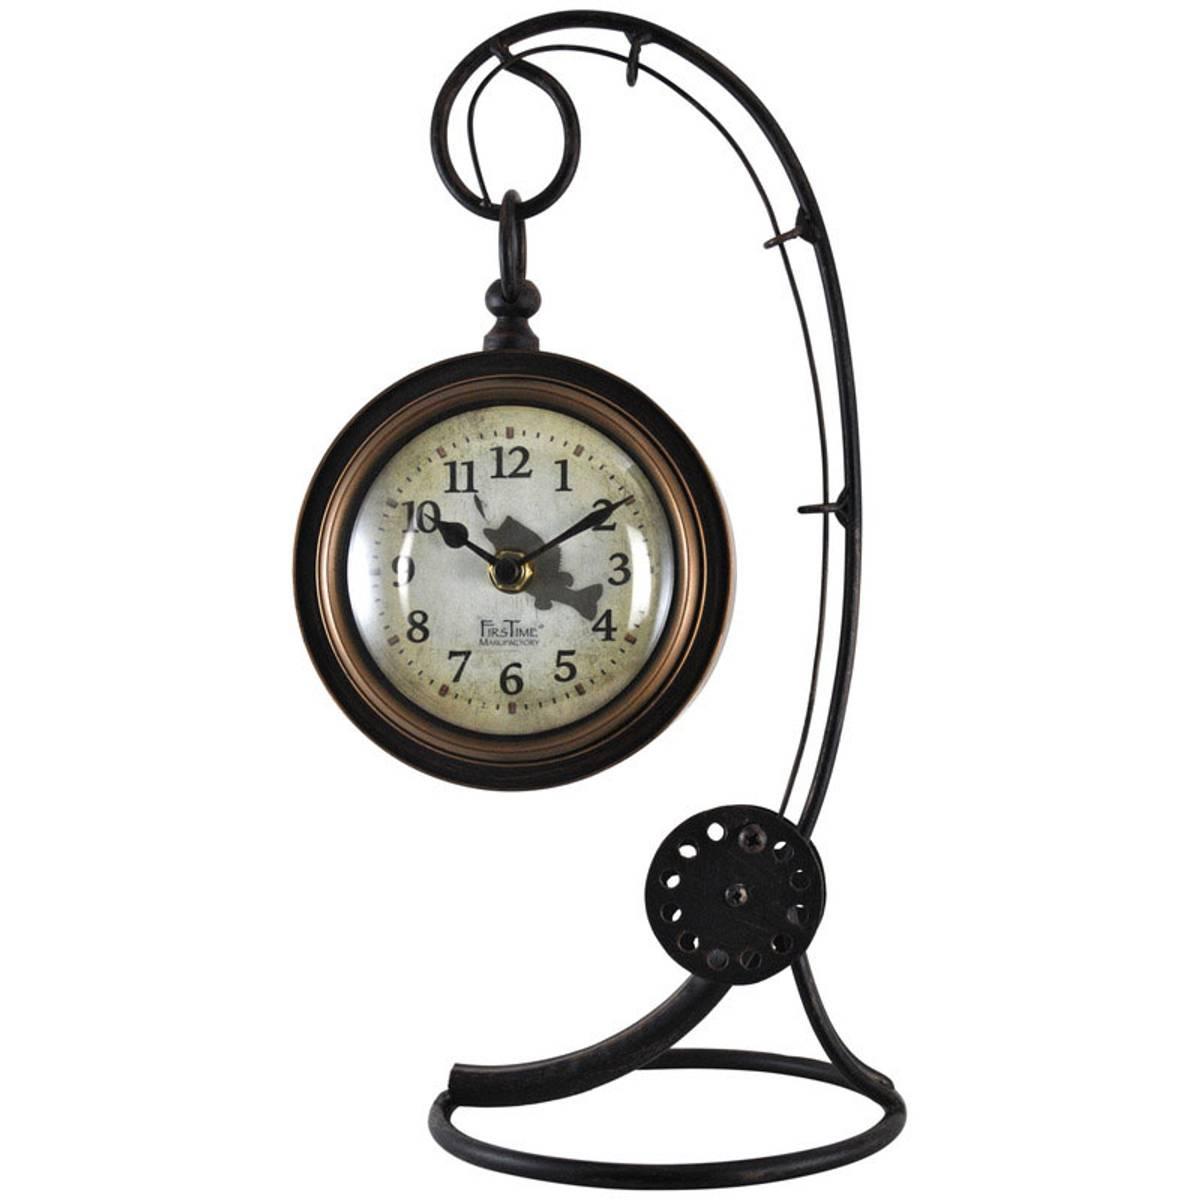 Shop clocks blains farm fleet firstime manufactory fishing rod tabletop clock amipublicfo Images